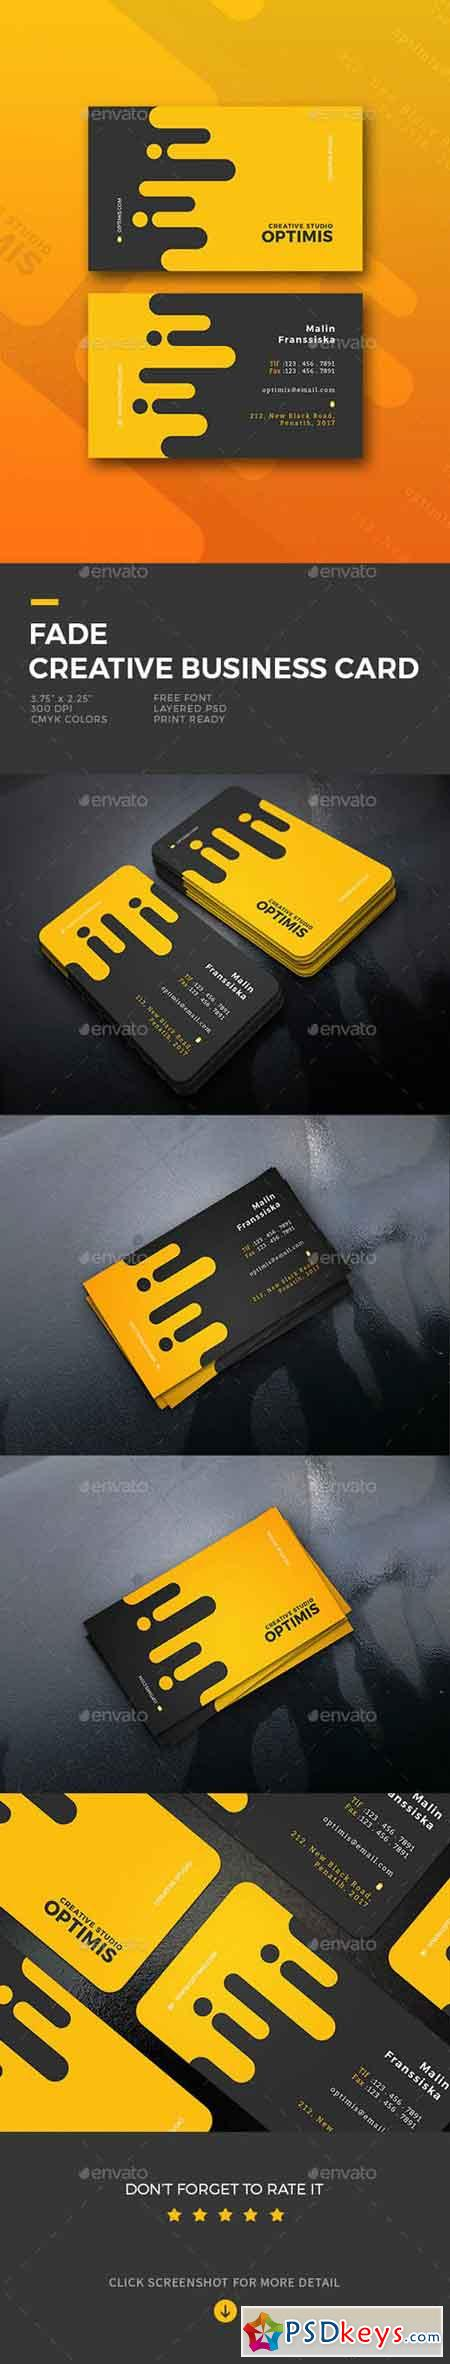 Fade Creative Business Card 19634383